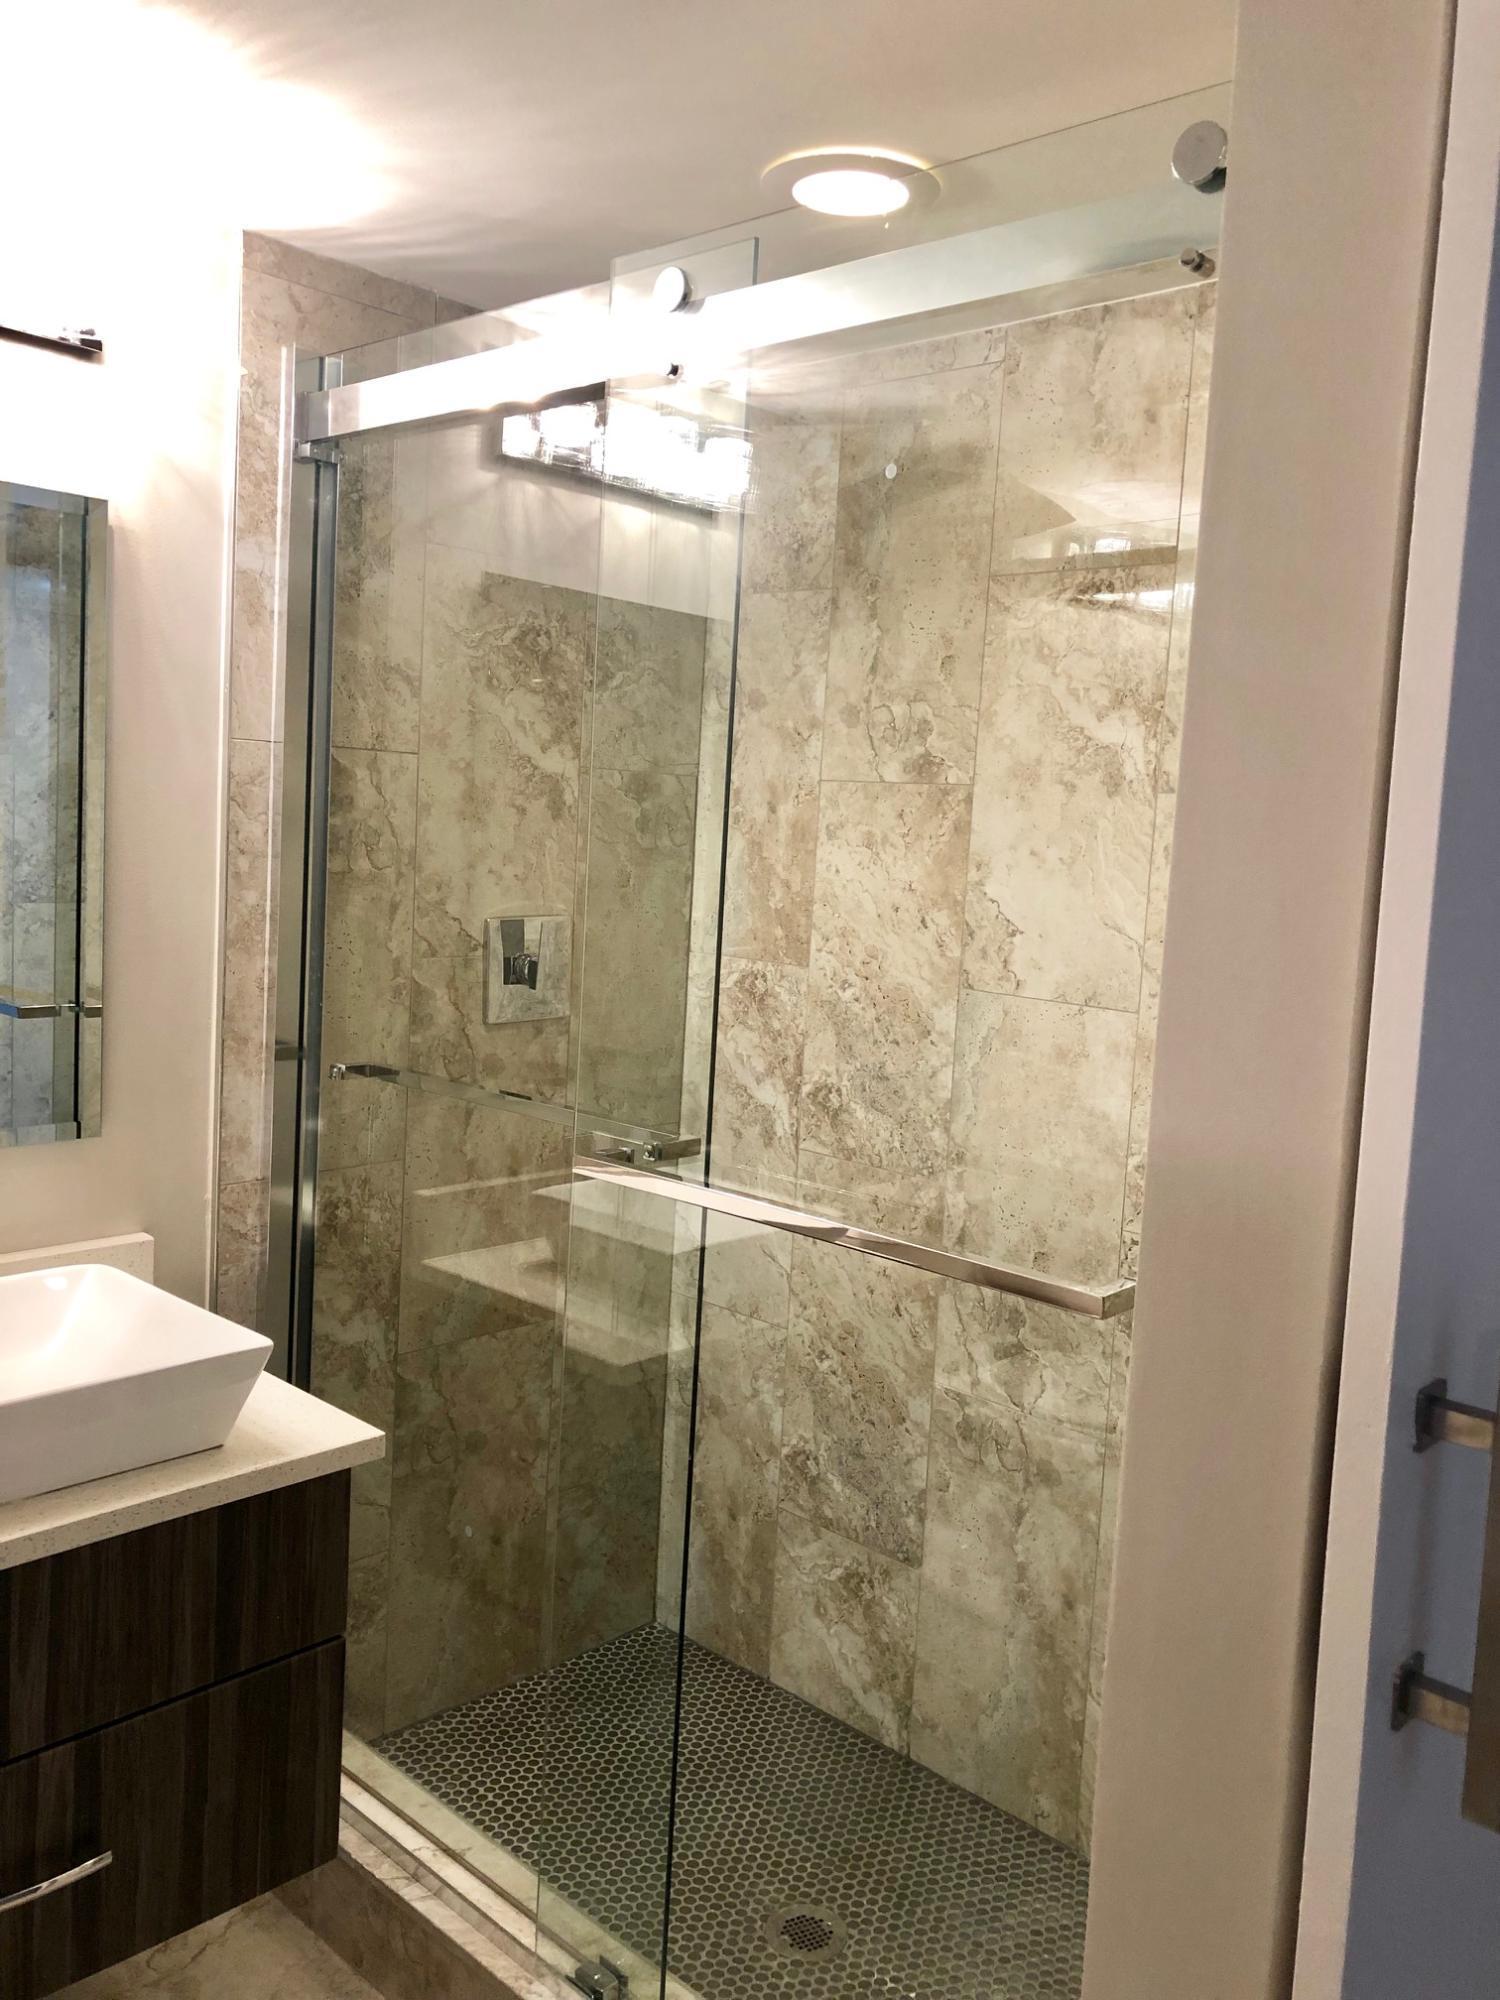 367 Auden Avenue, Columbus, Ohio 43215, 2 Bedrooms Bedrooms, ,2 BathroomsBathrooms,Residential,For Sale,Auden,219031784